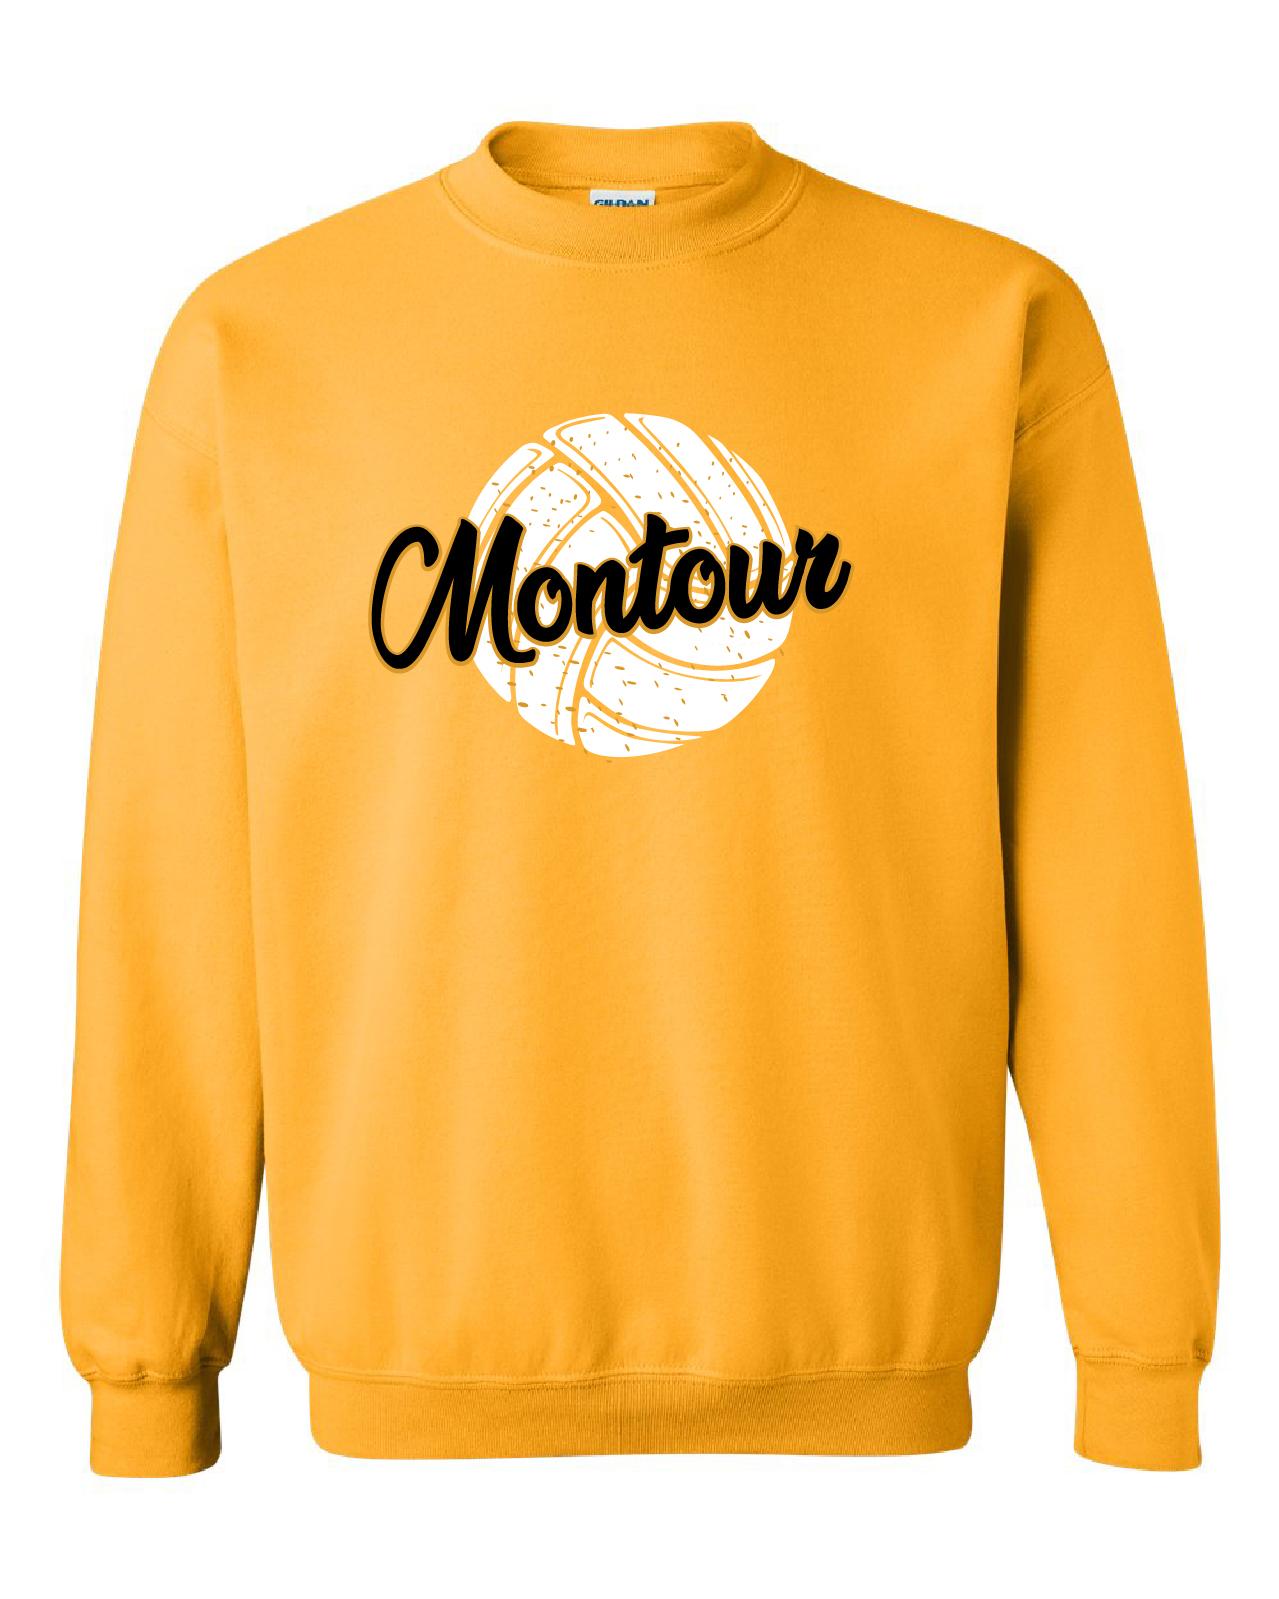 Gildan – Heavy Blend Crewneck Sweatshirt DESIGN A